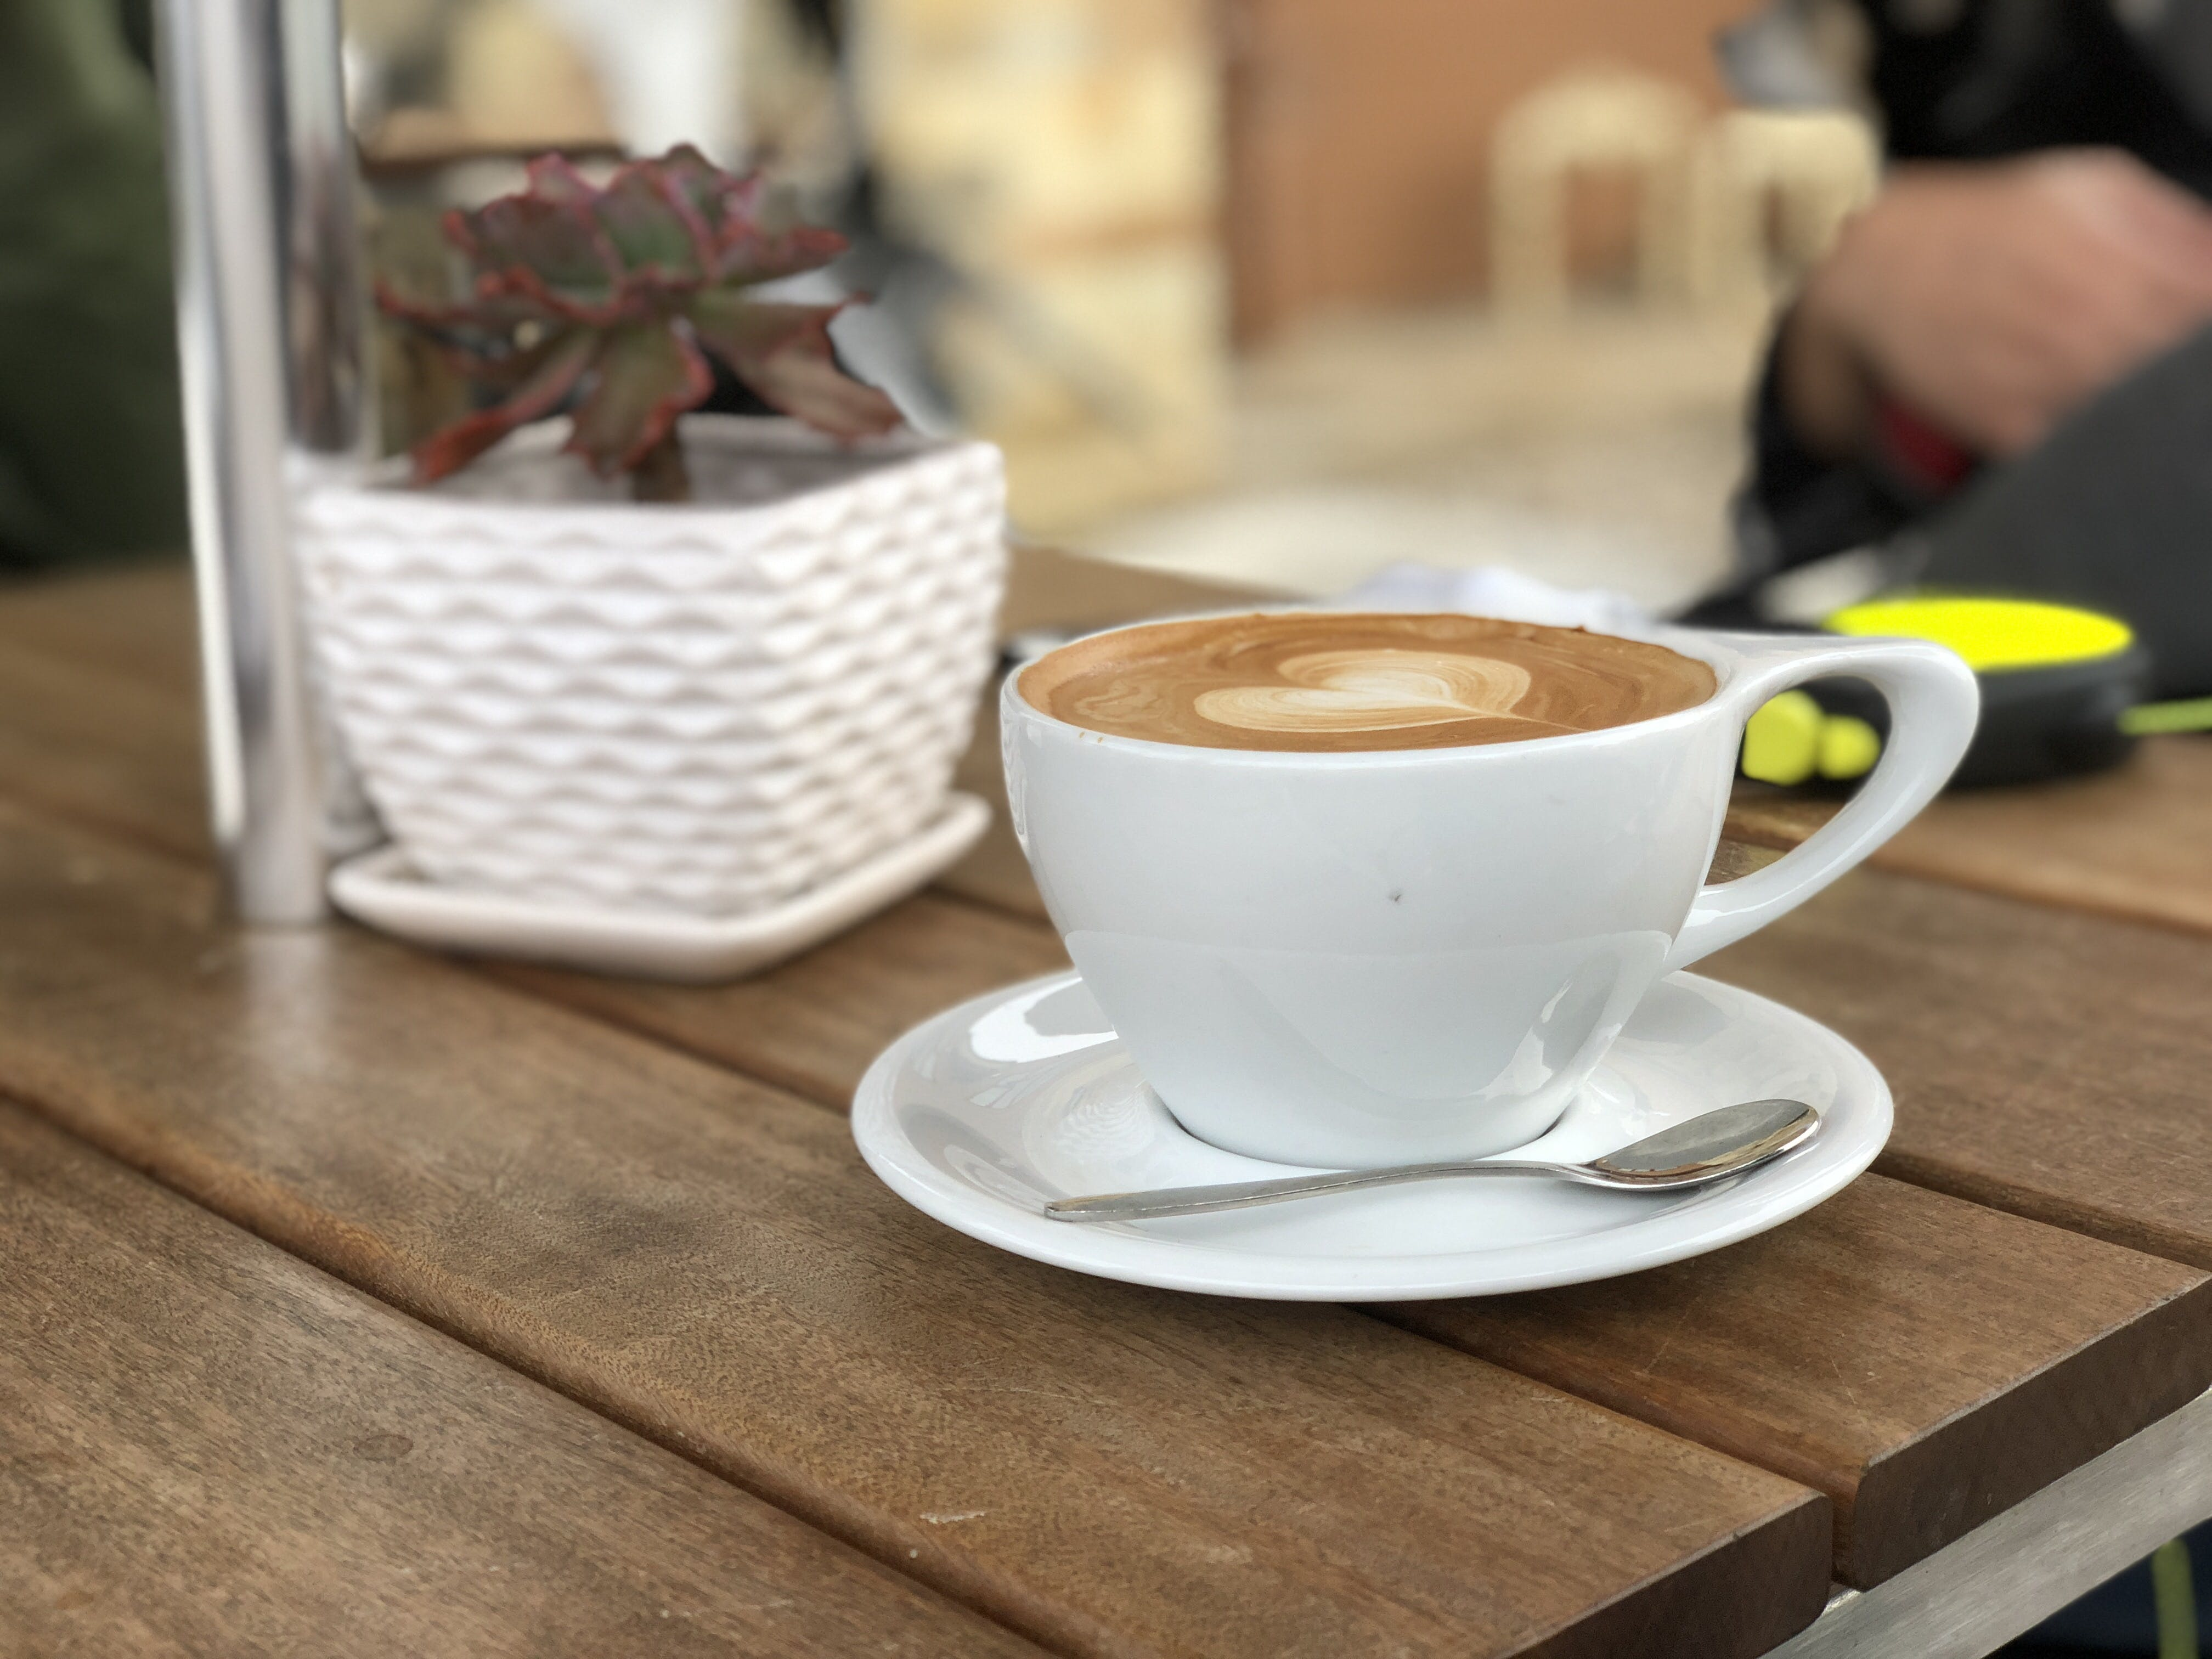 White Ceramic Coffee Mug With Saucer and Teaspoon